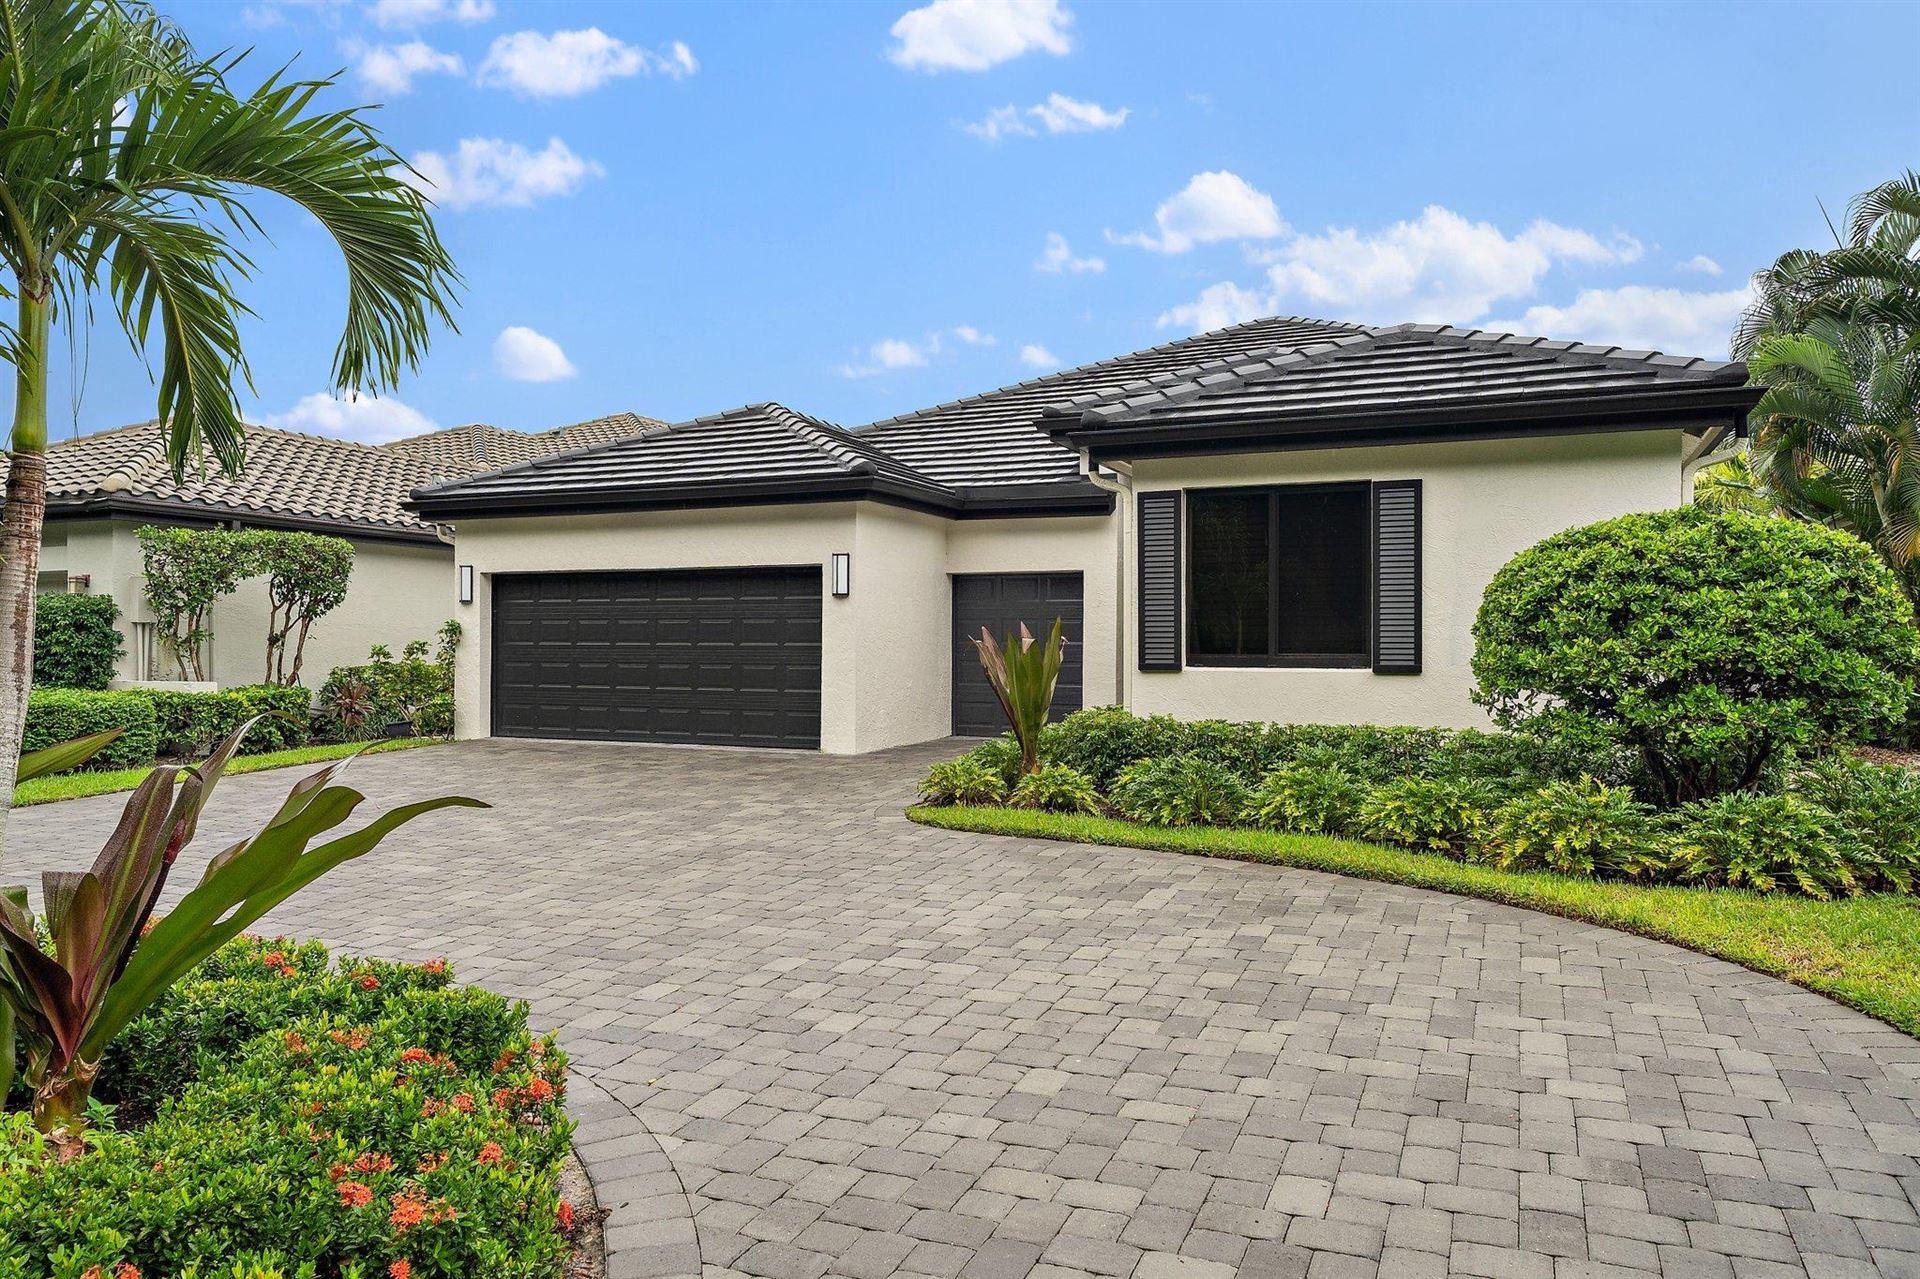 Photo of 3811 Toulouse Drive, Palm Beach Gardens, FL 33410 (MLS # RX-10665415)